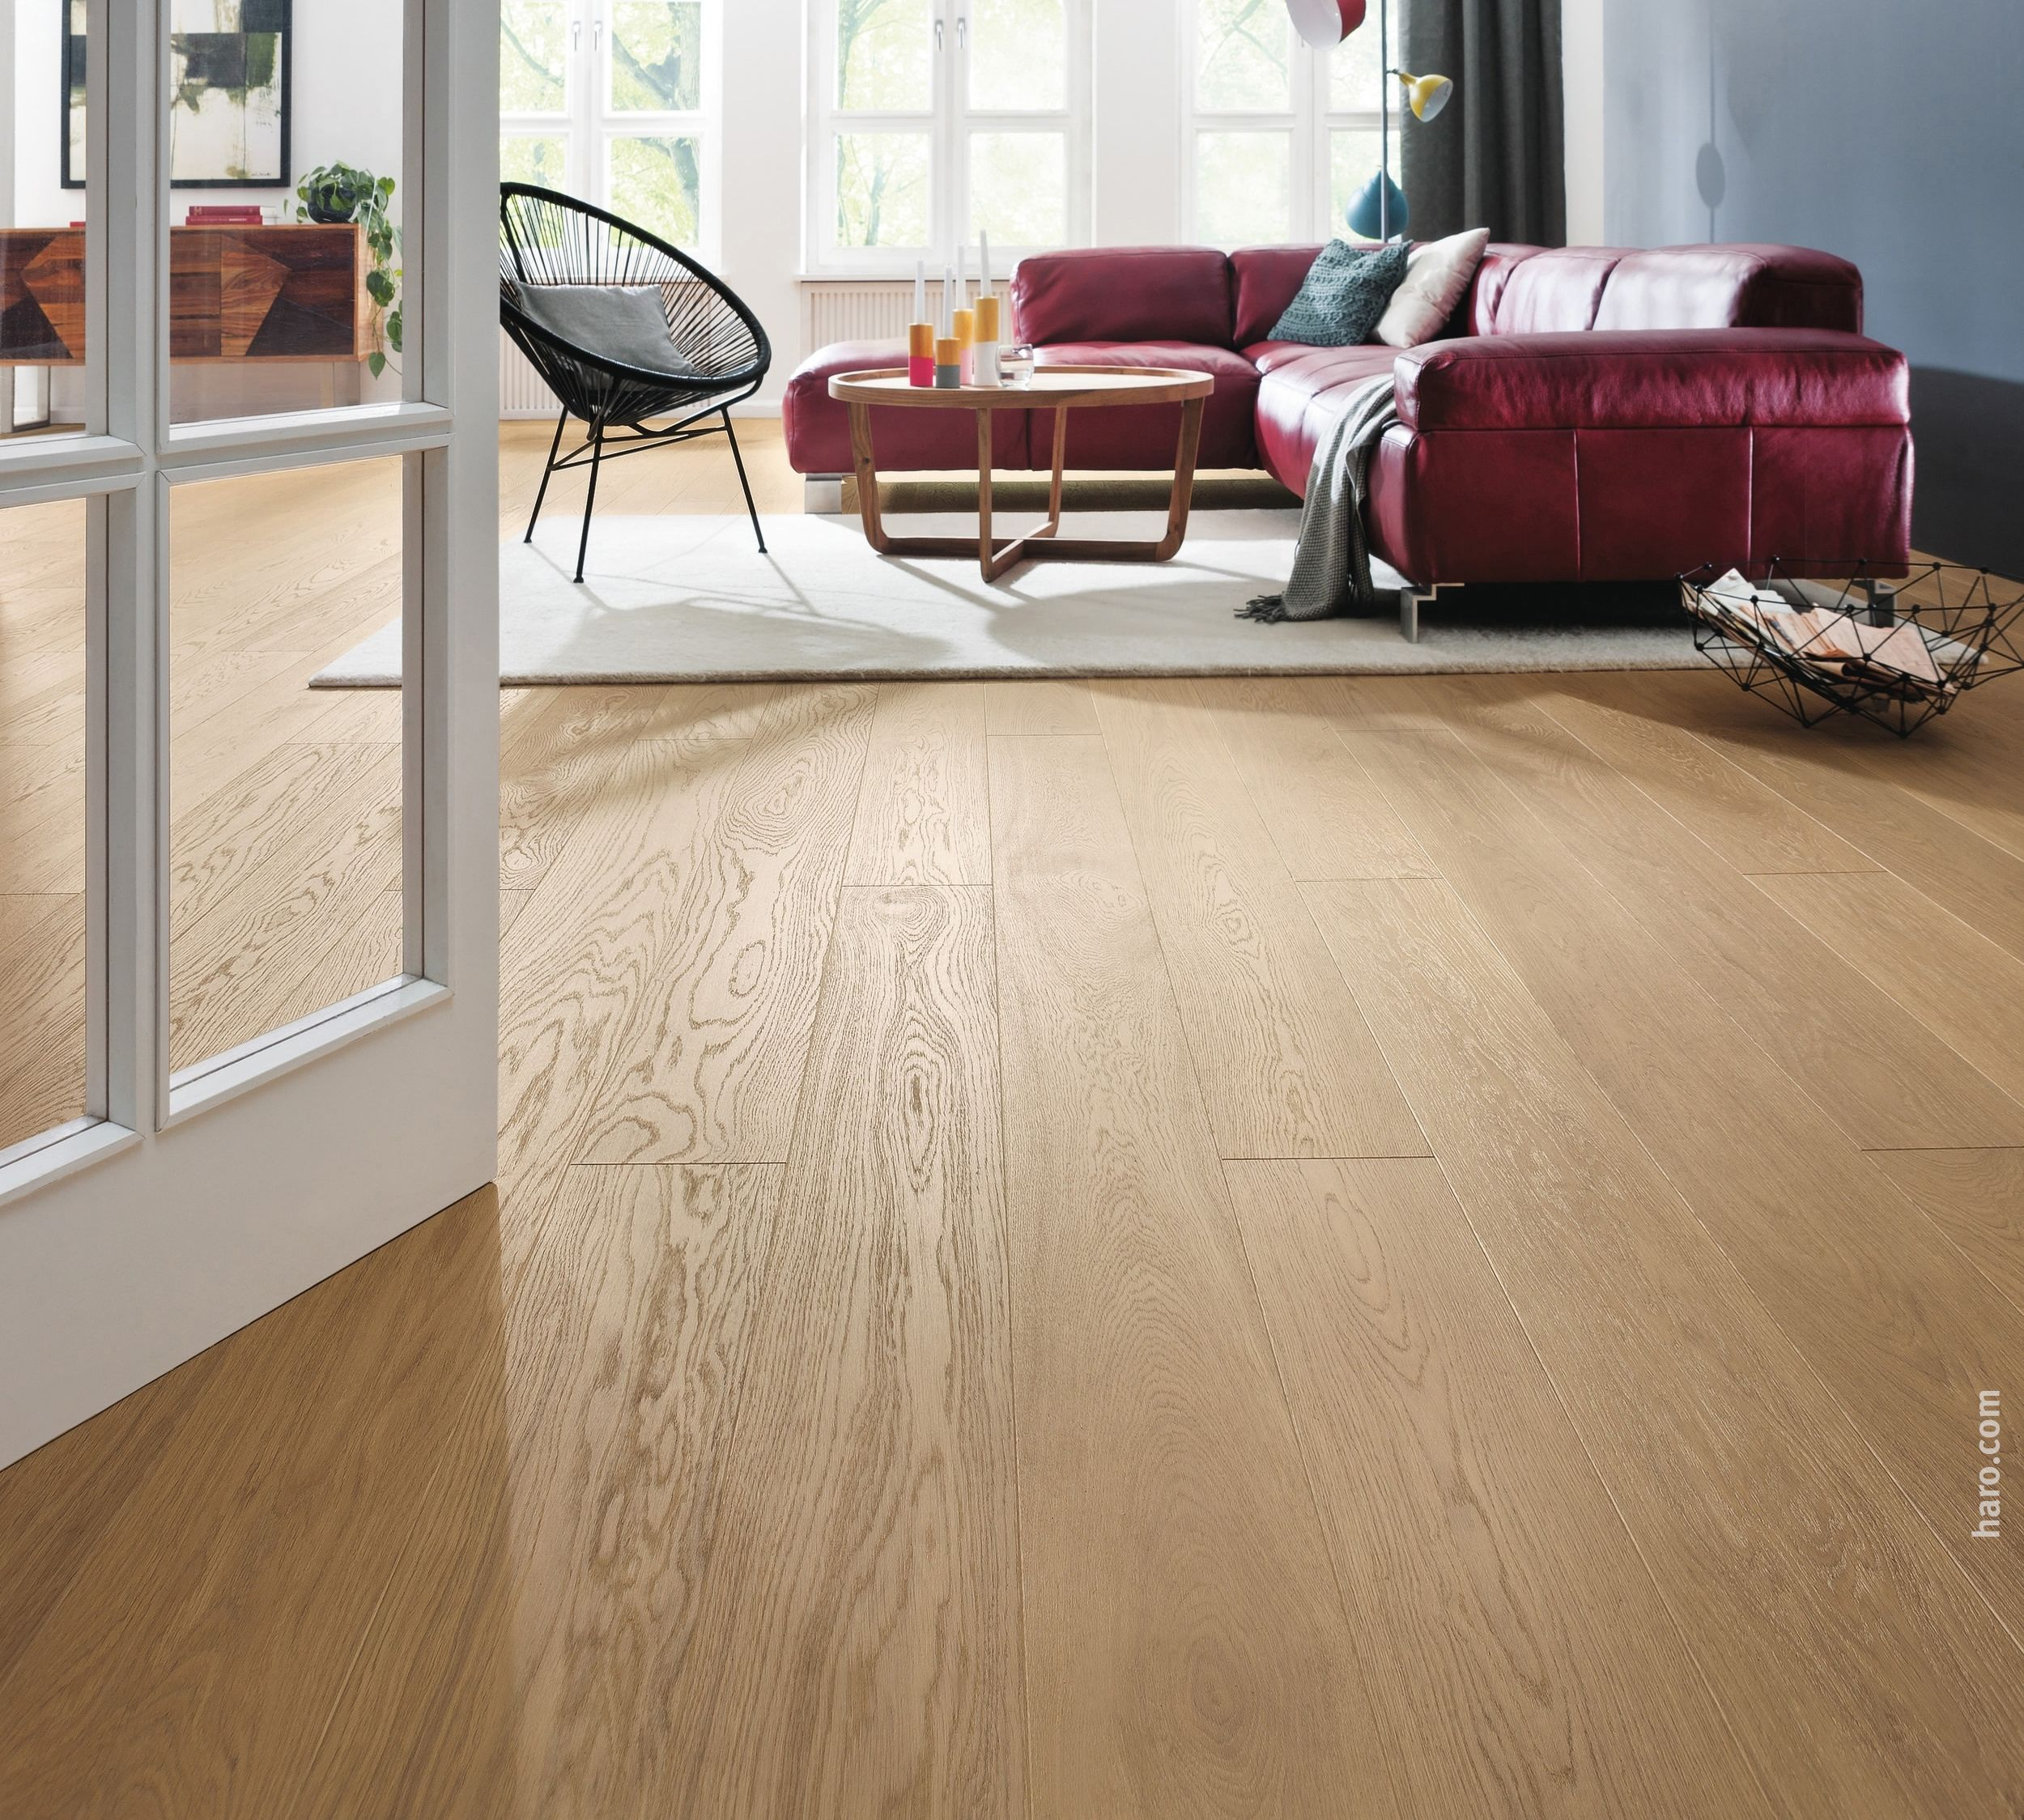 haro parkett boden flooring ideas and house. Black Bedroom Furniture Sets. Home Design Ideas